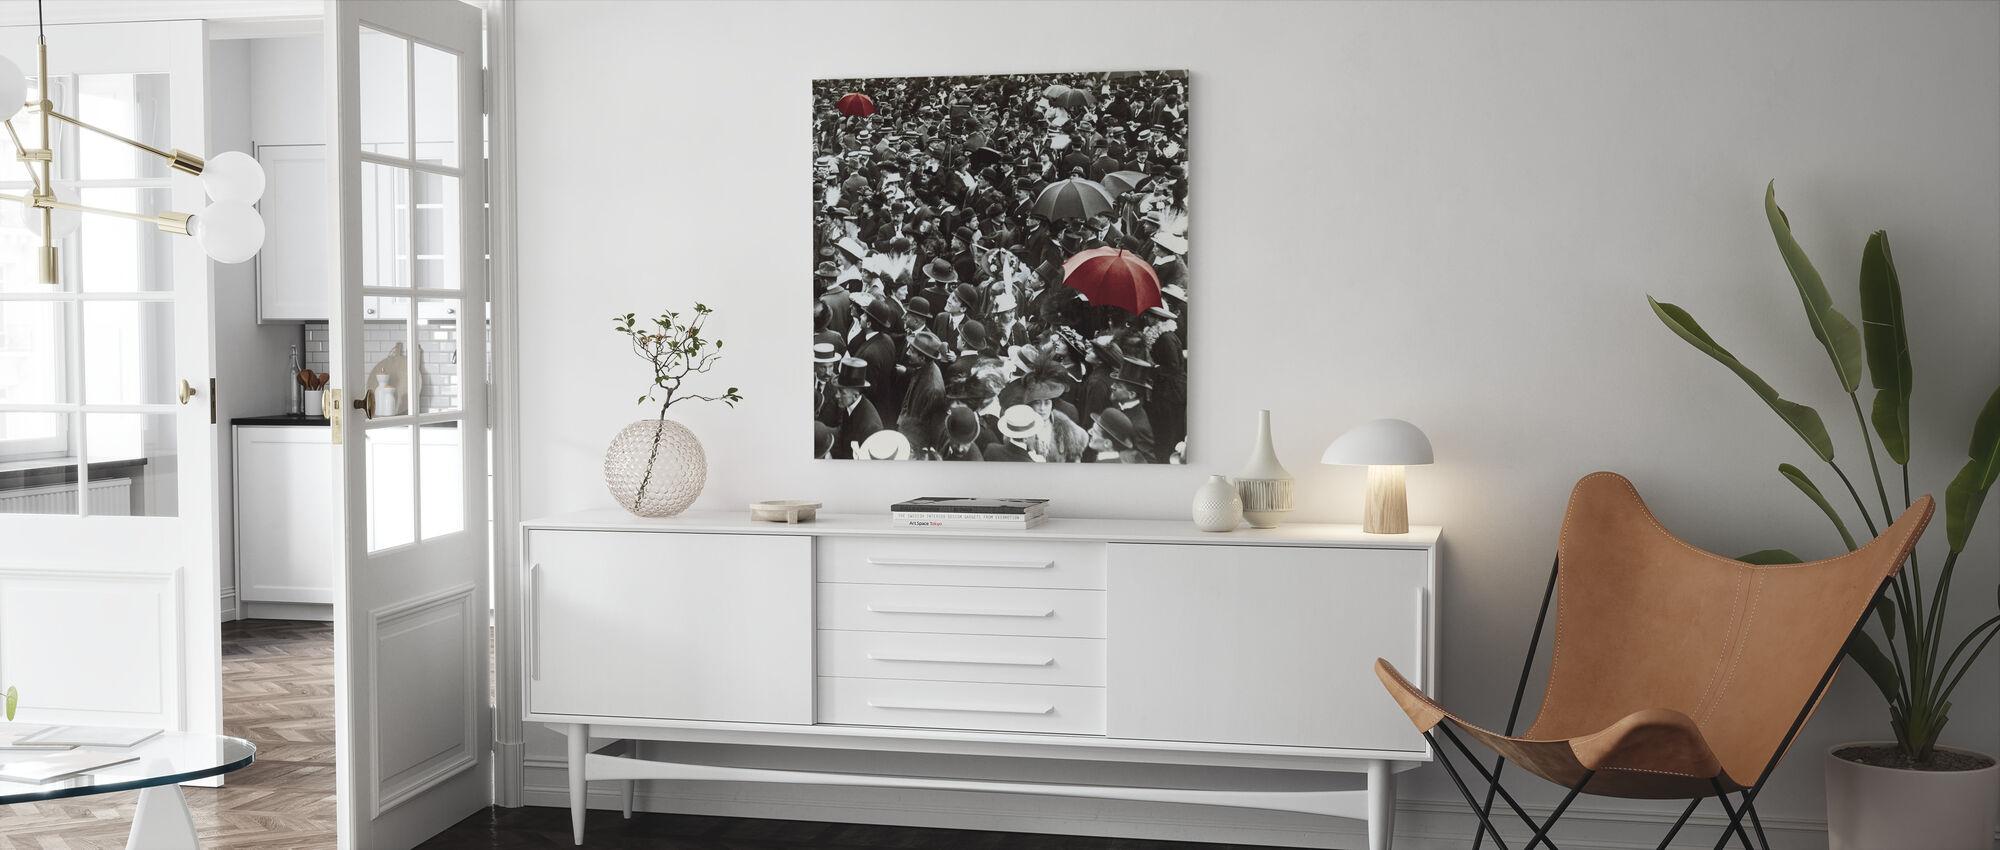 De kroning - Canvas print - Woonkamer